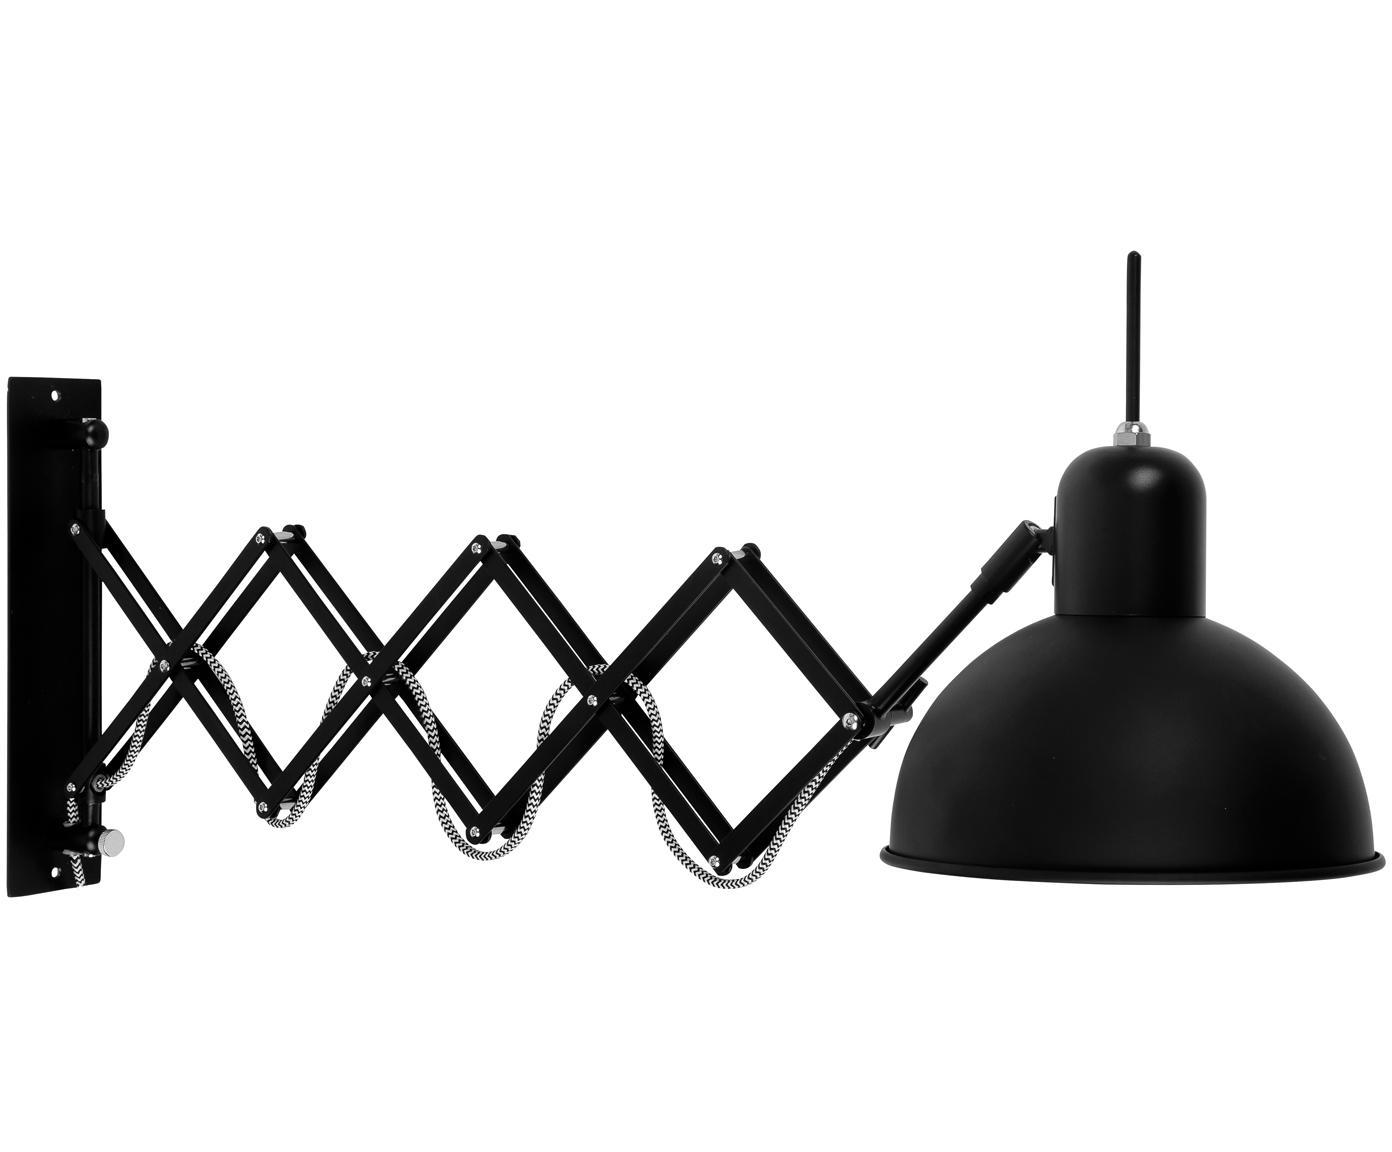 Wandlamp Fjallbacka met stekker, Lamp: gelakt metaal, Zwart, 25 x 27 cm